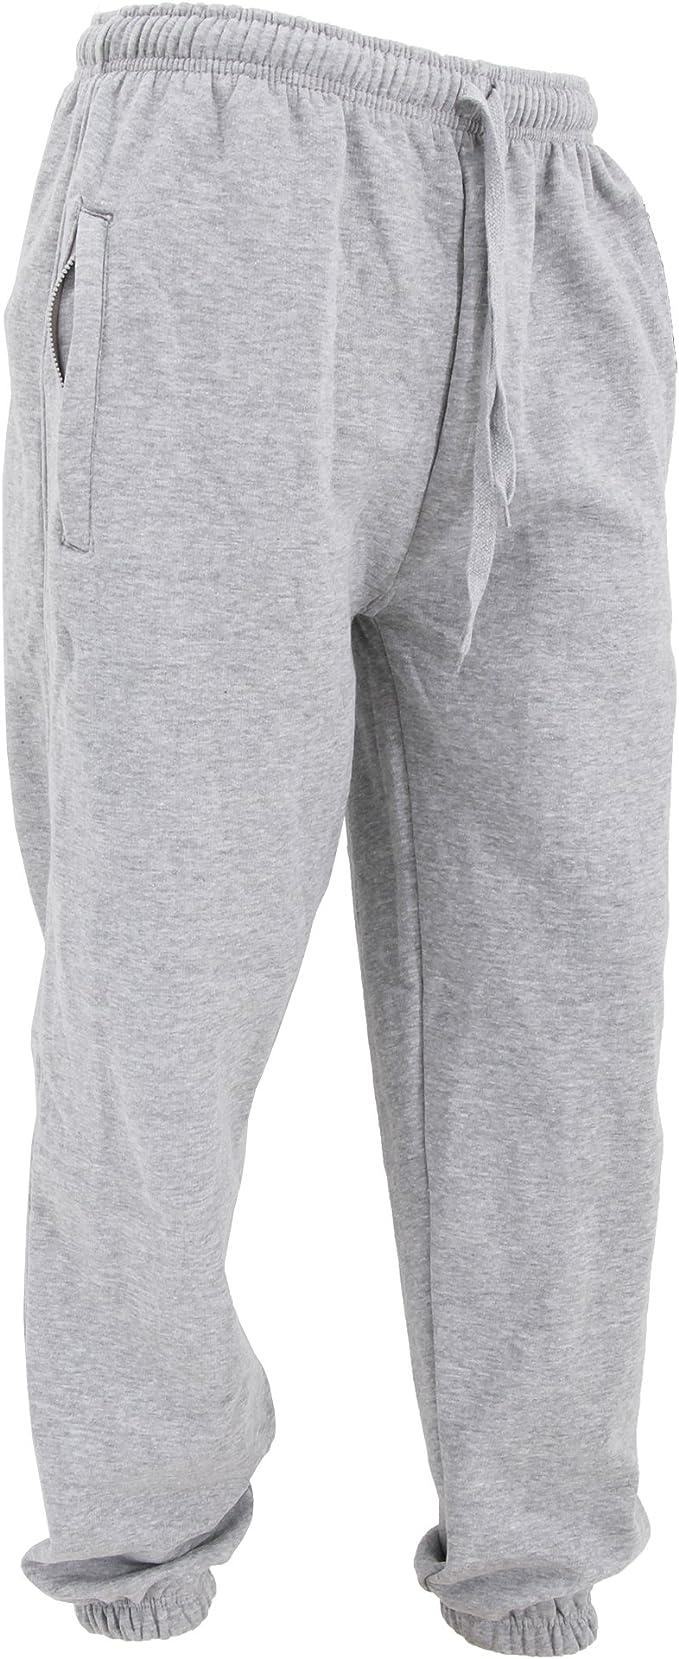 Floso - Pantalón de chándal de Deporte/Gymnasio Elasticos para ...